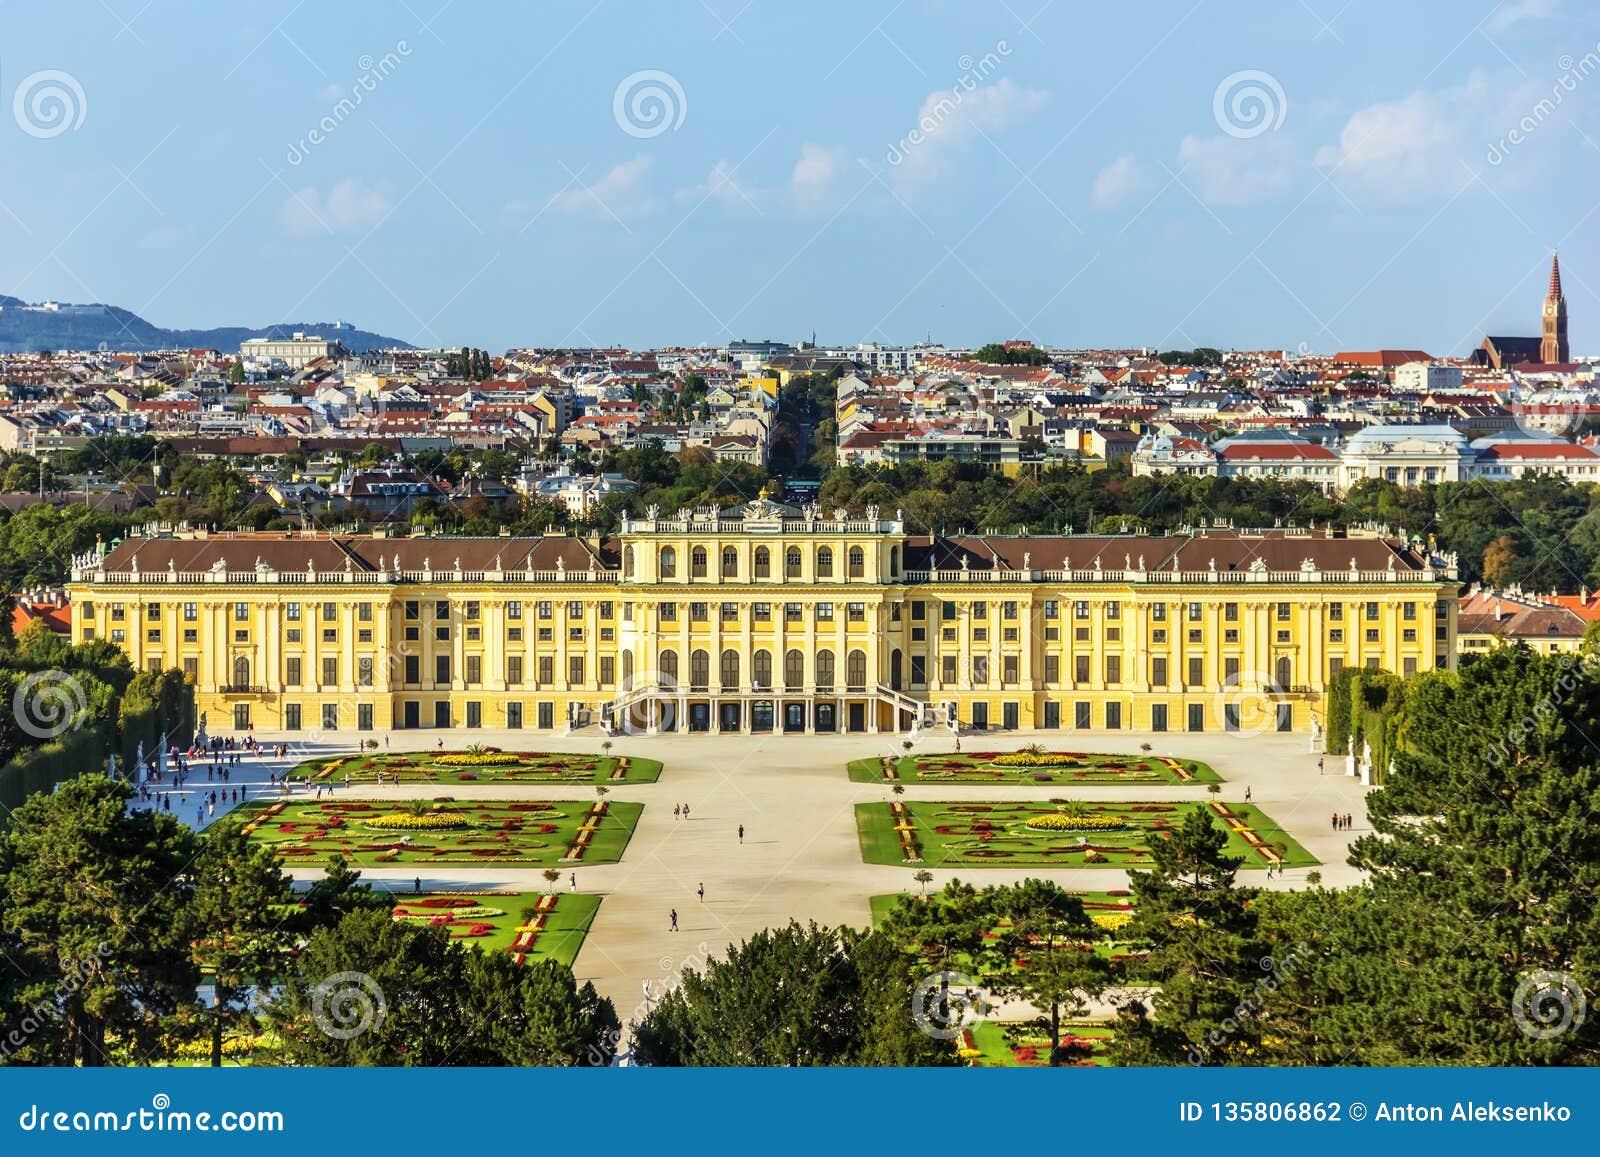 Palácio de Schonbrunn em Viena, Áustria, de vista completa